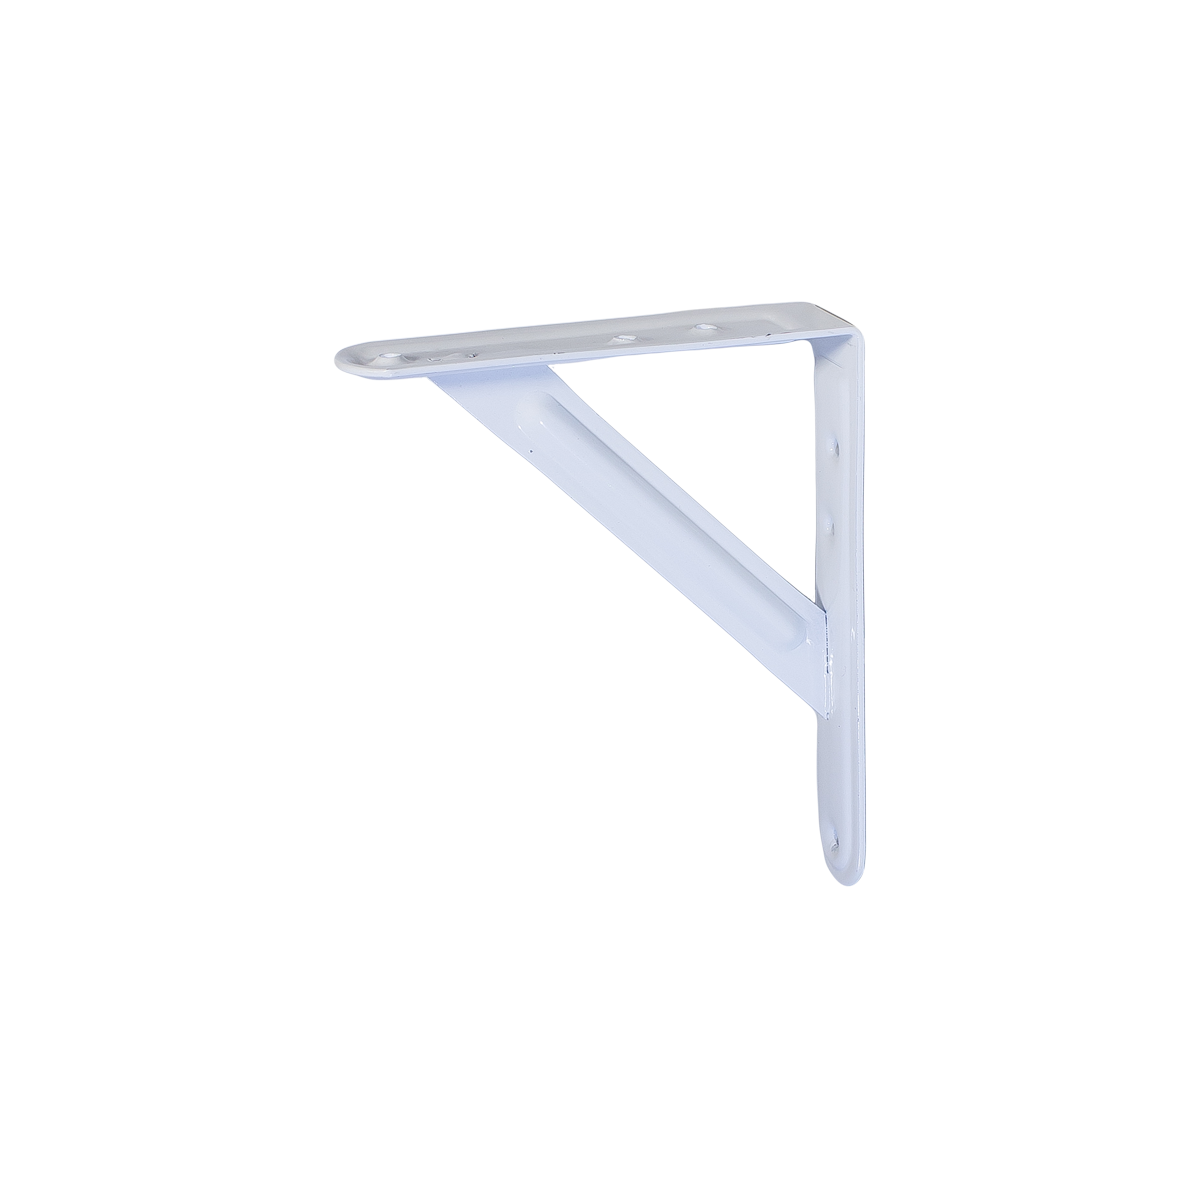 Кронштейн Стронг 125*150мм белый